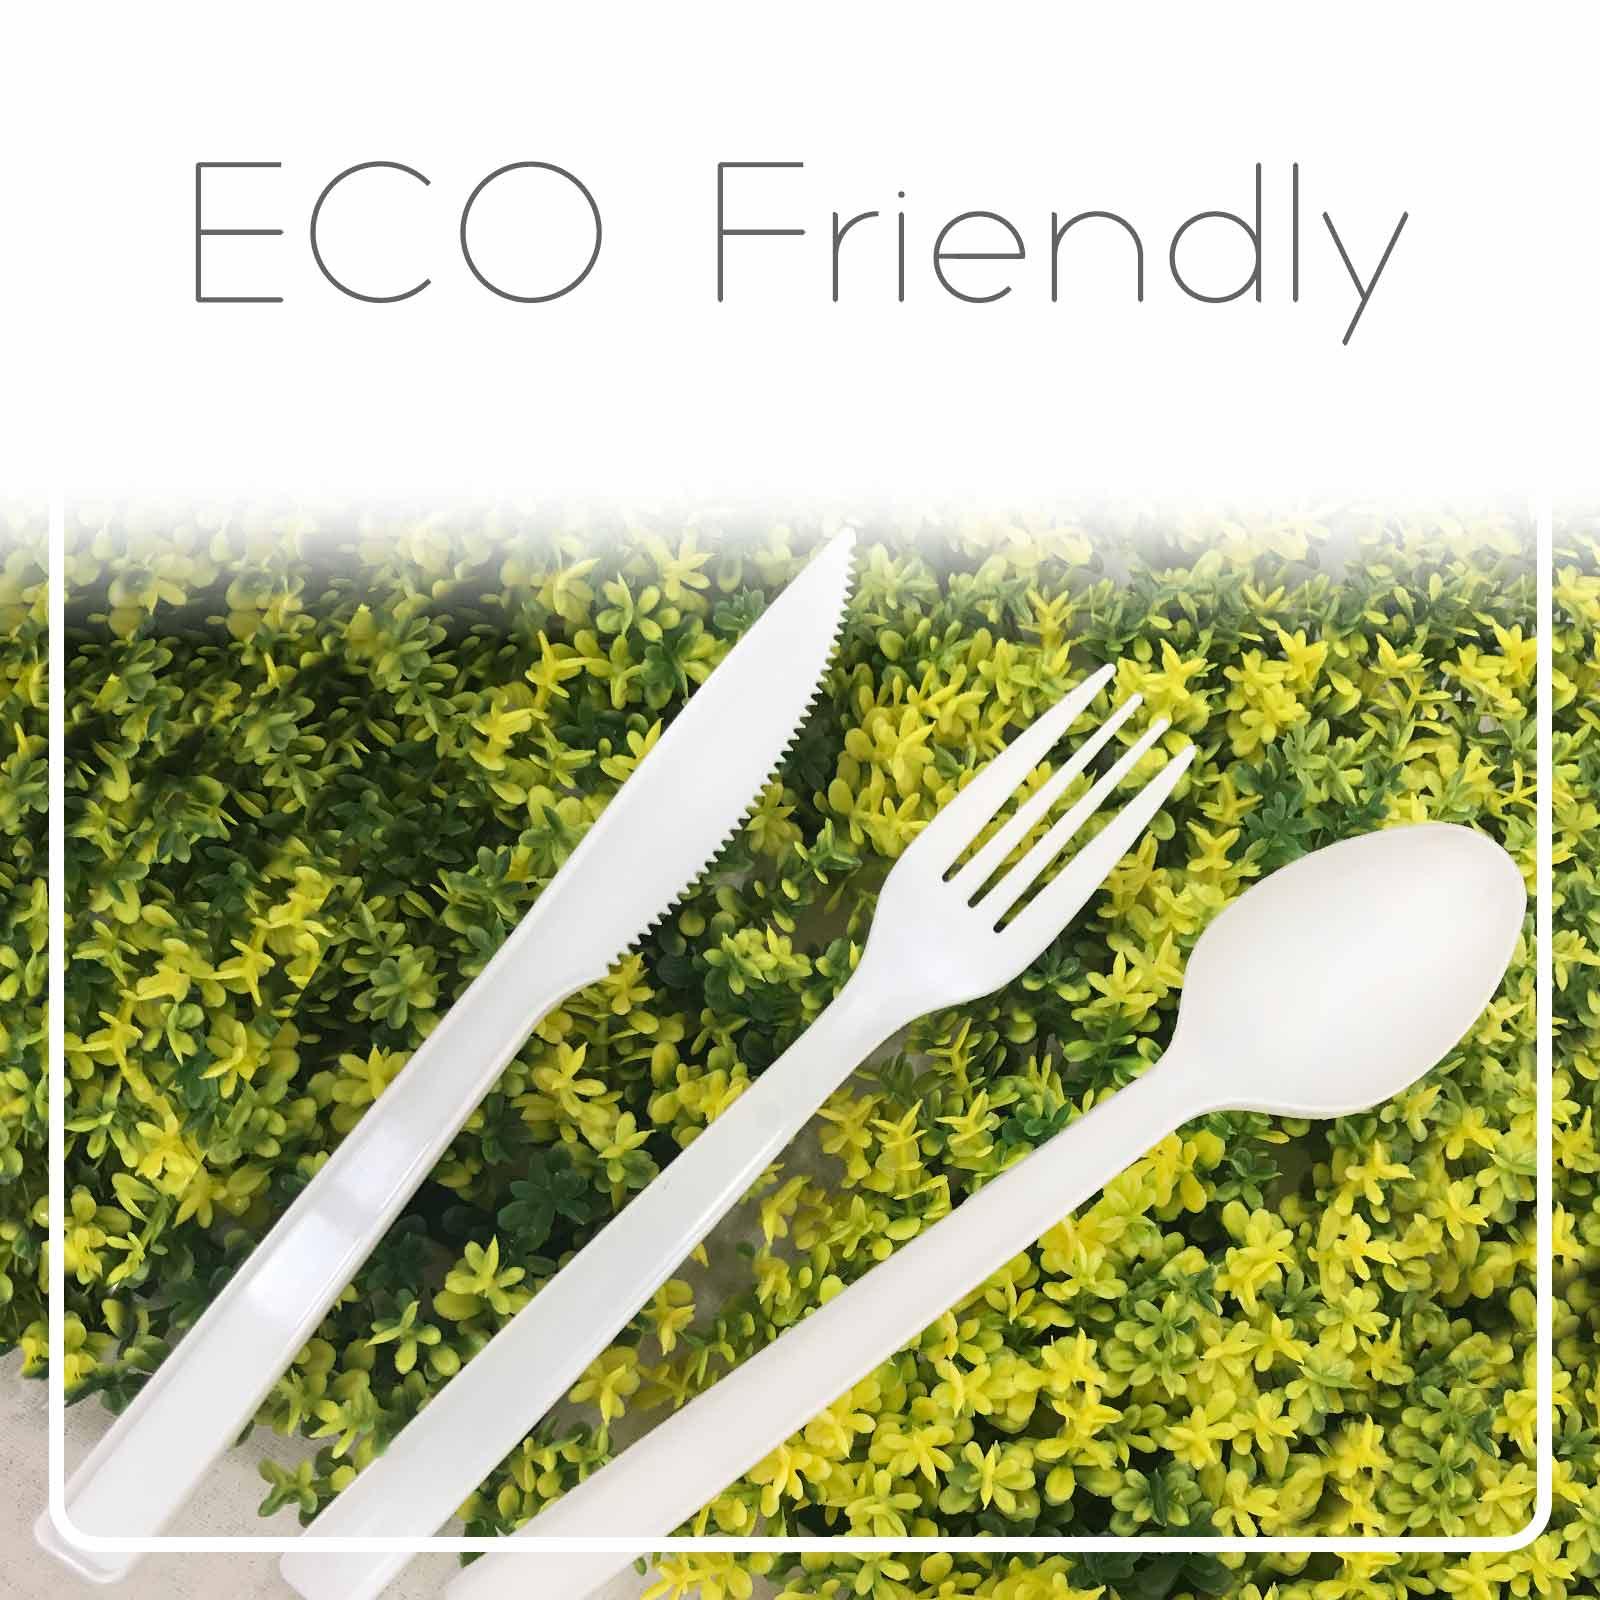 Eco Friendly Tableware - Eco friendly disposable utensil